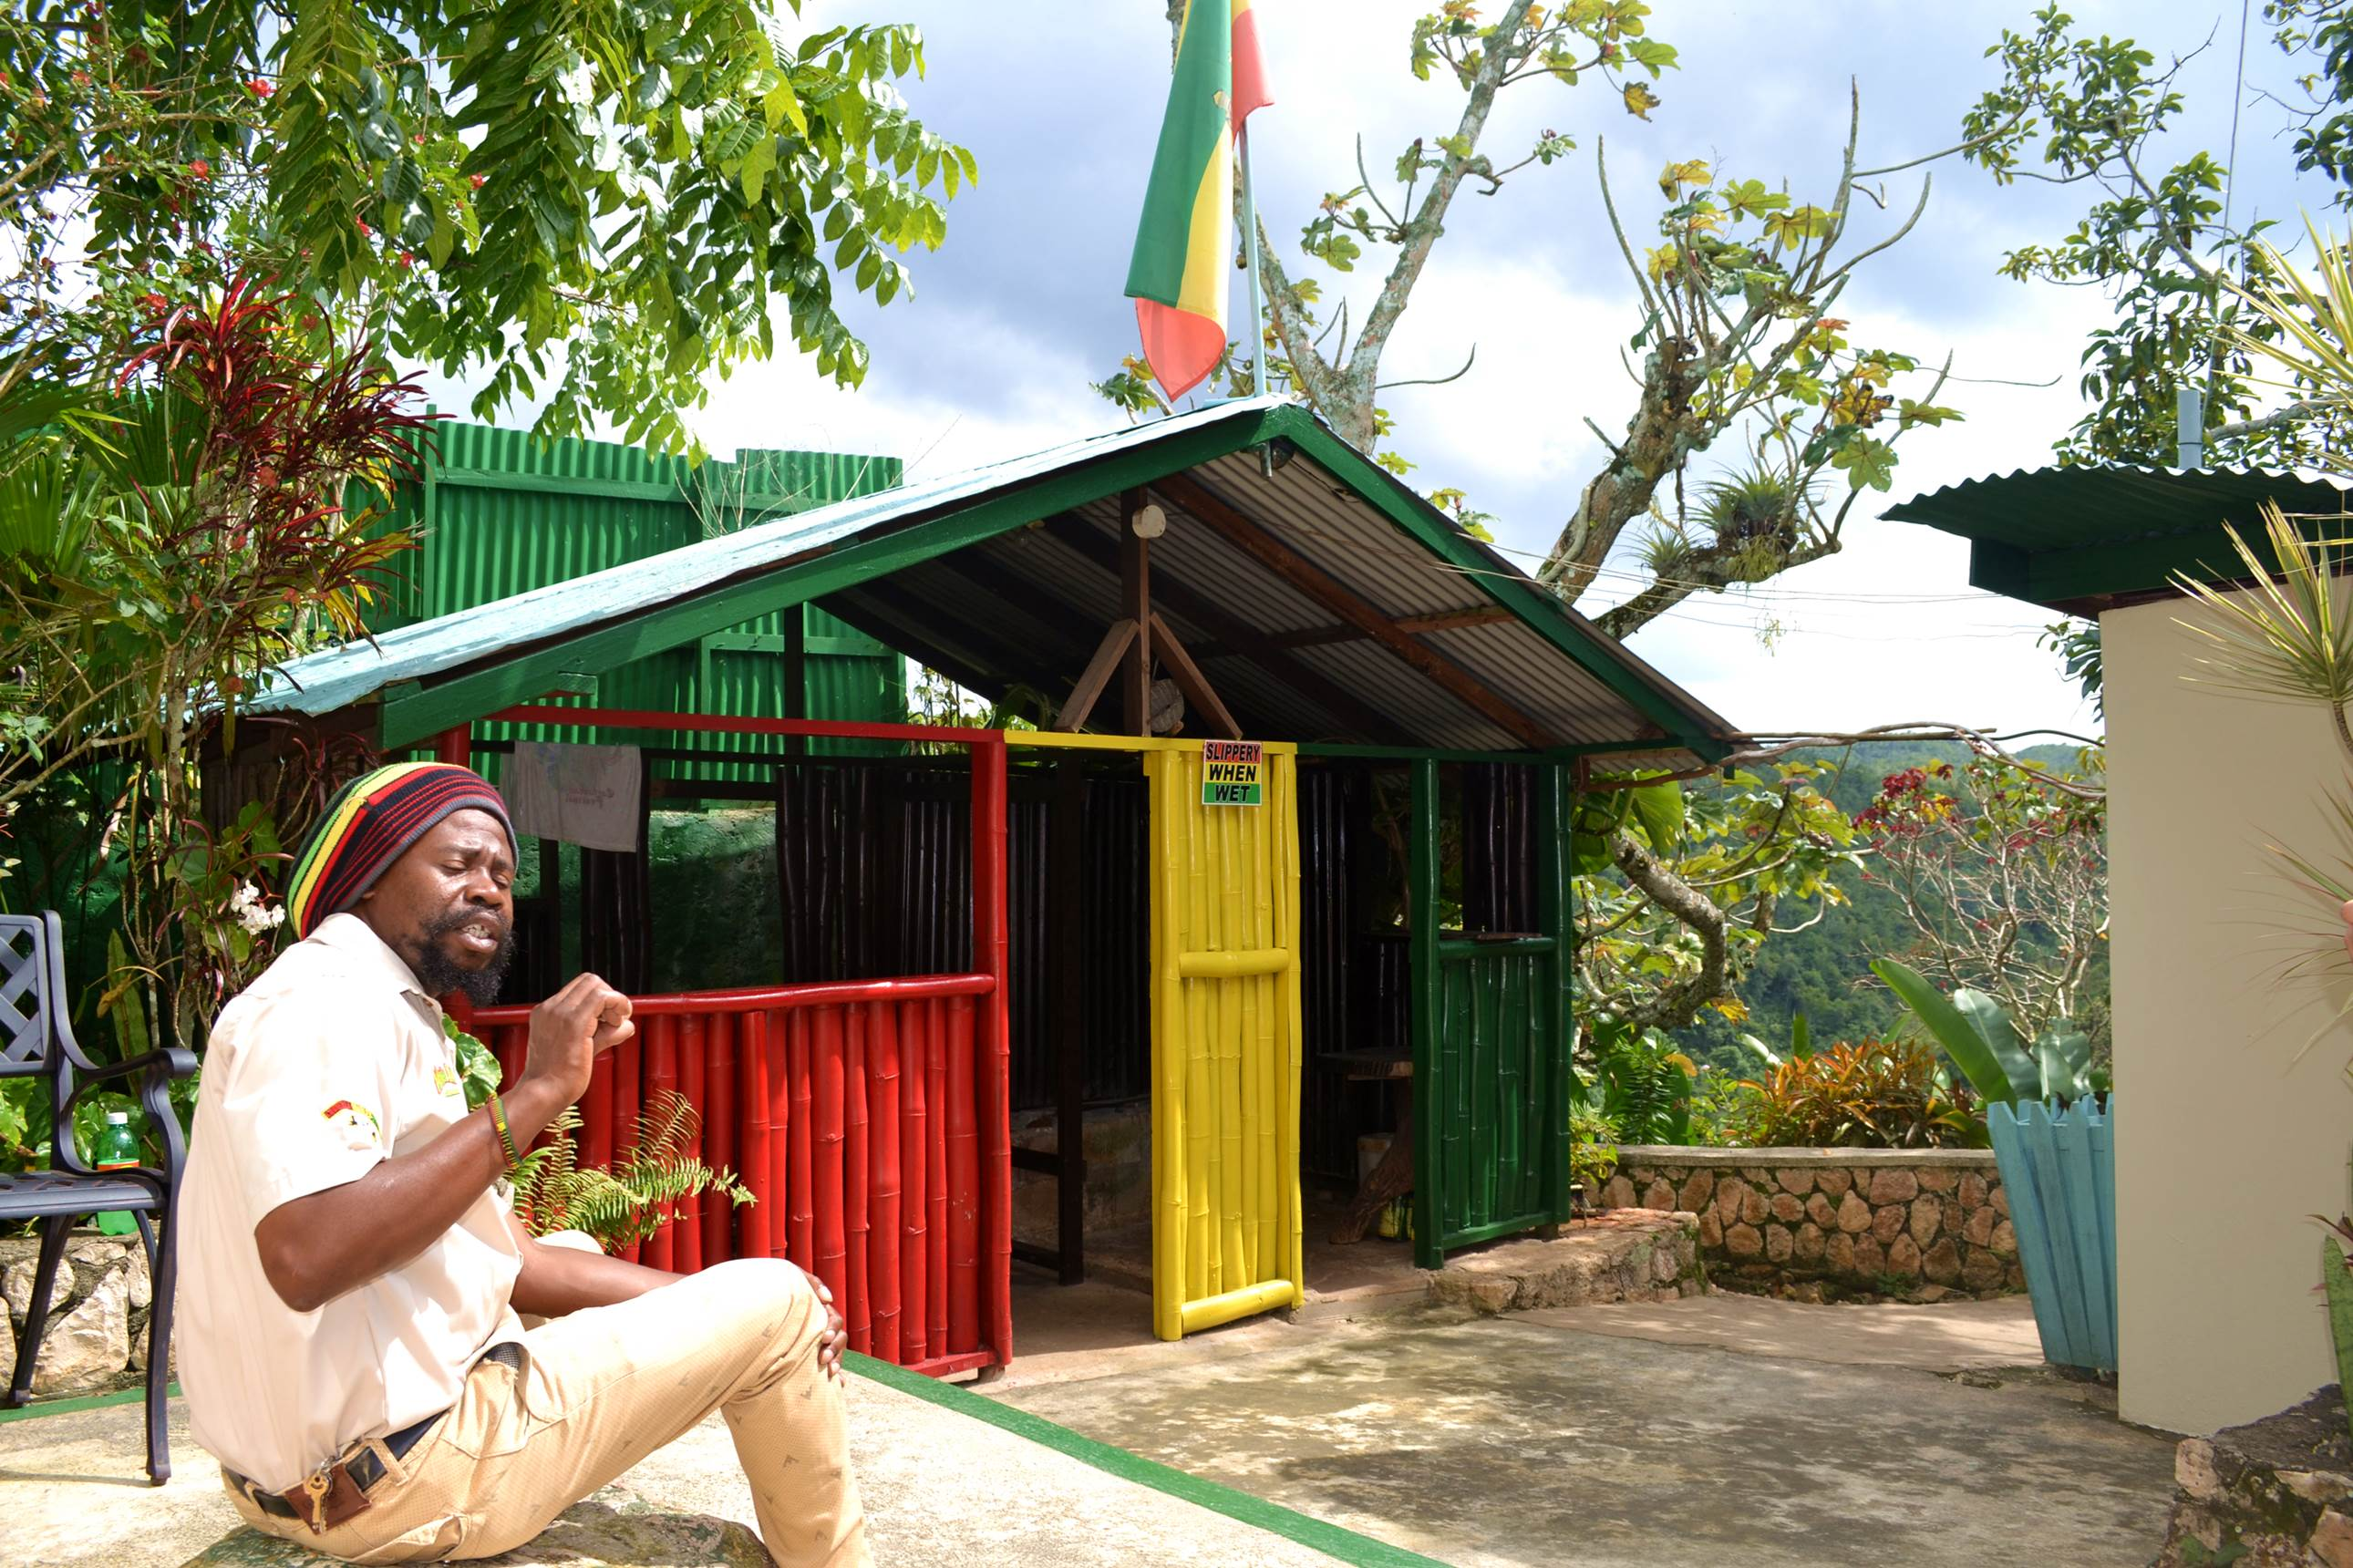 ninemile_jamaica_bobmarley